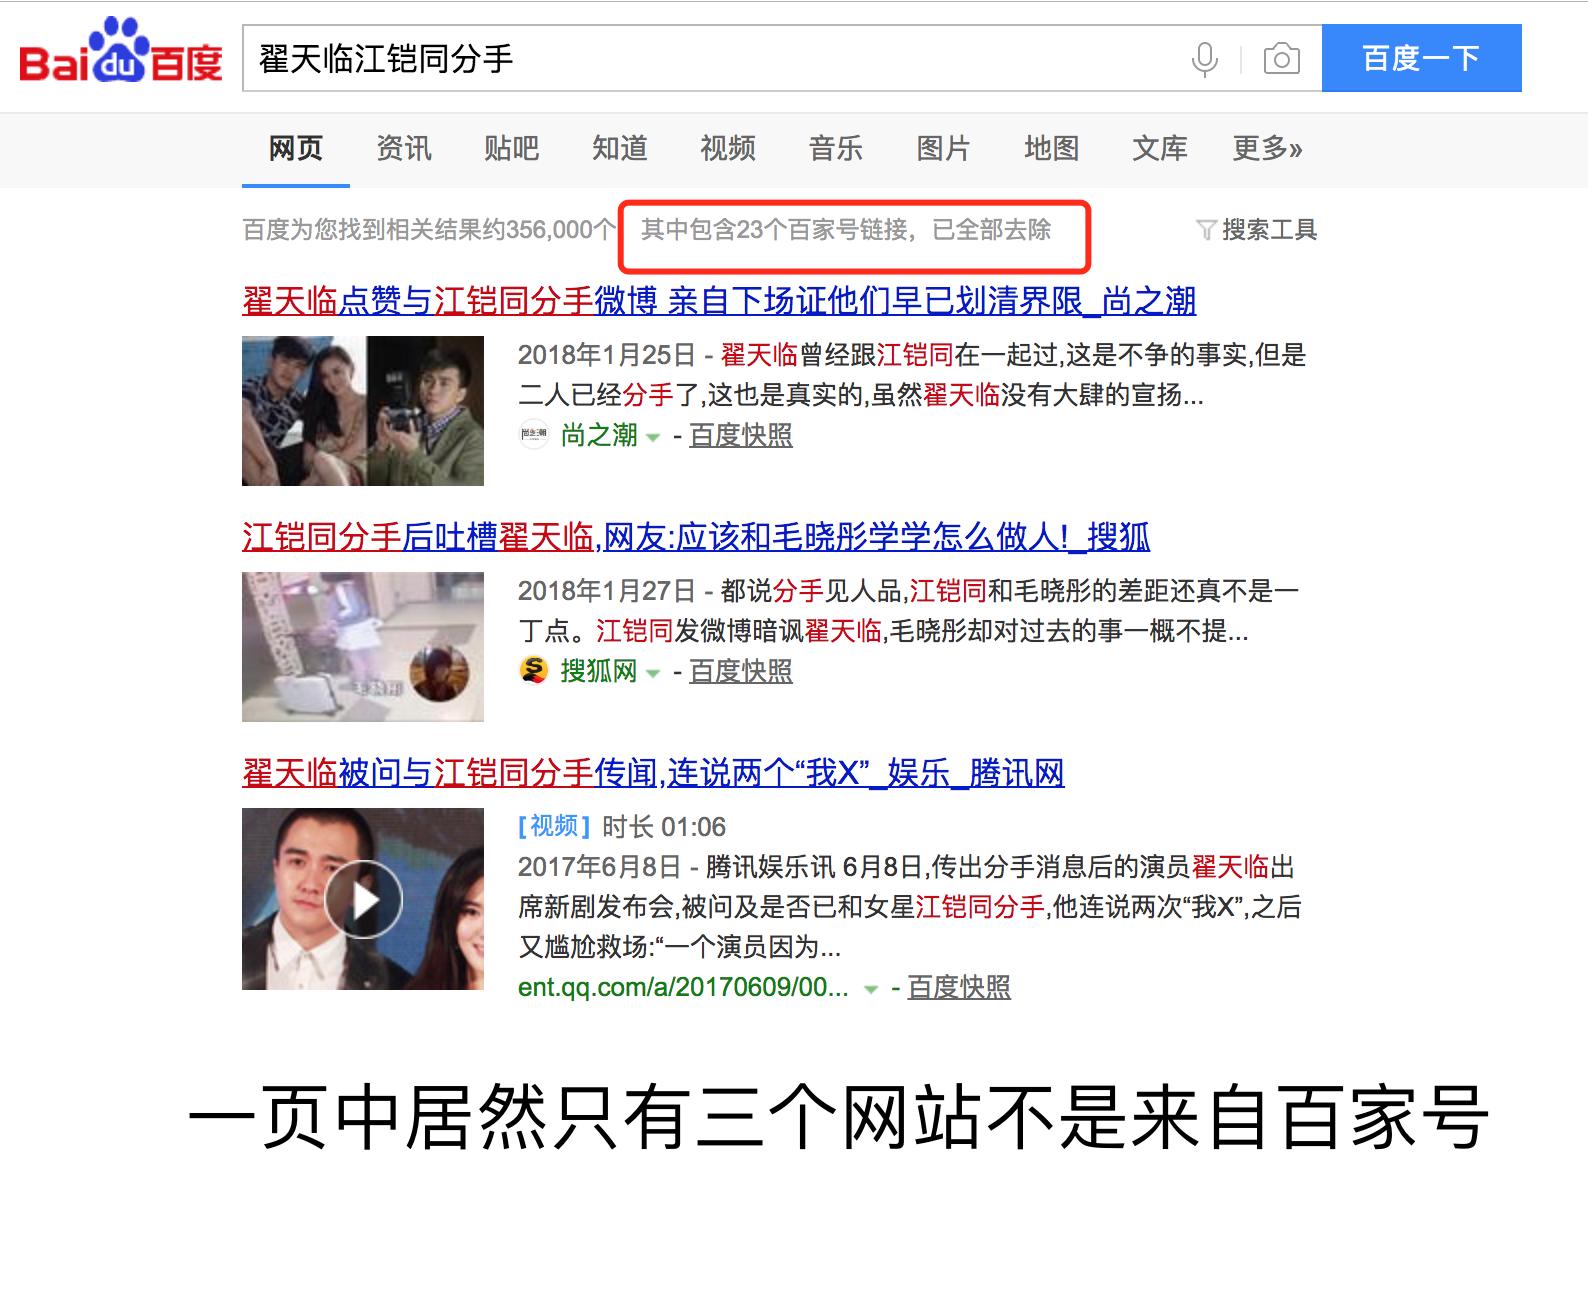 https://github.com/LuRenJiasWorld/Baijiahao-Fucker/raw/master/image2.png